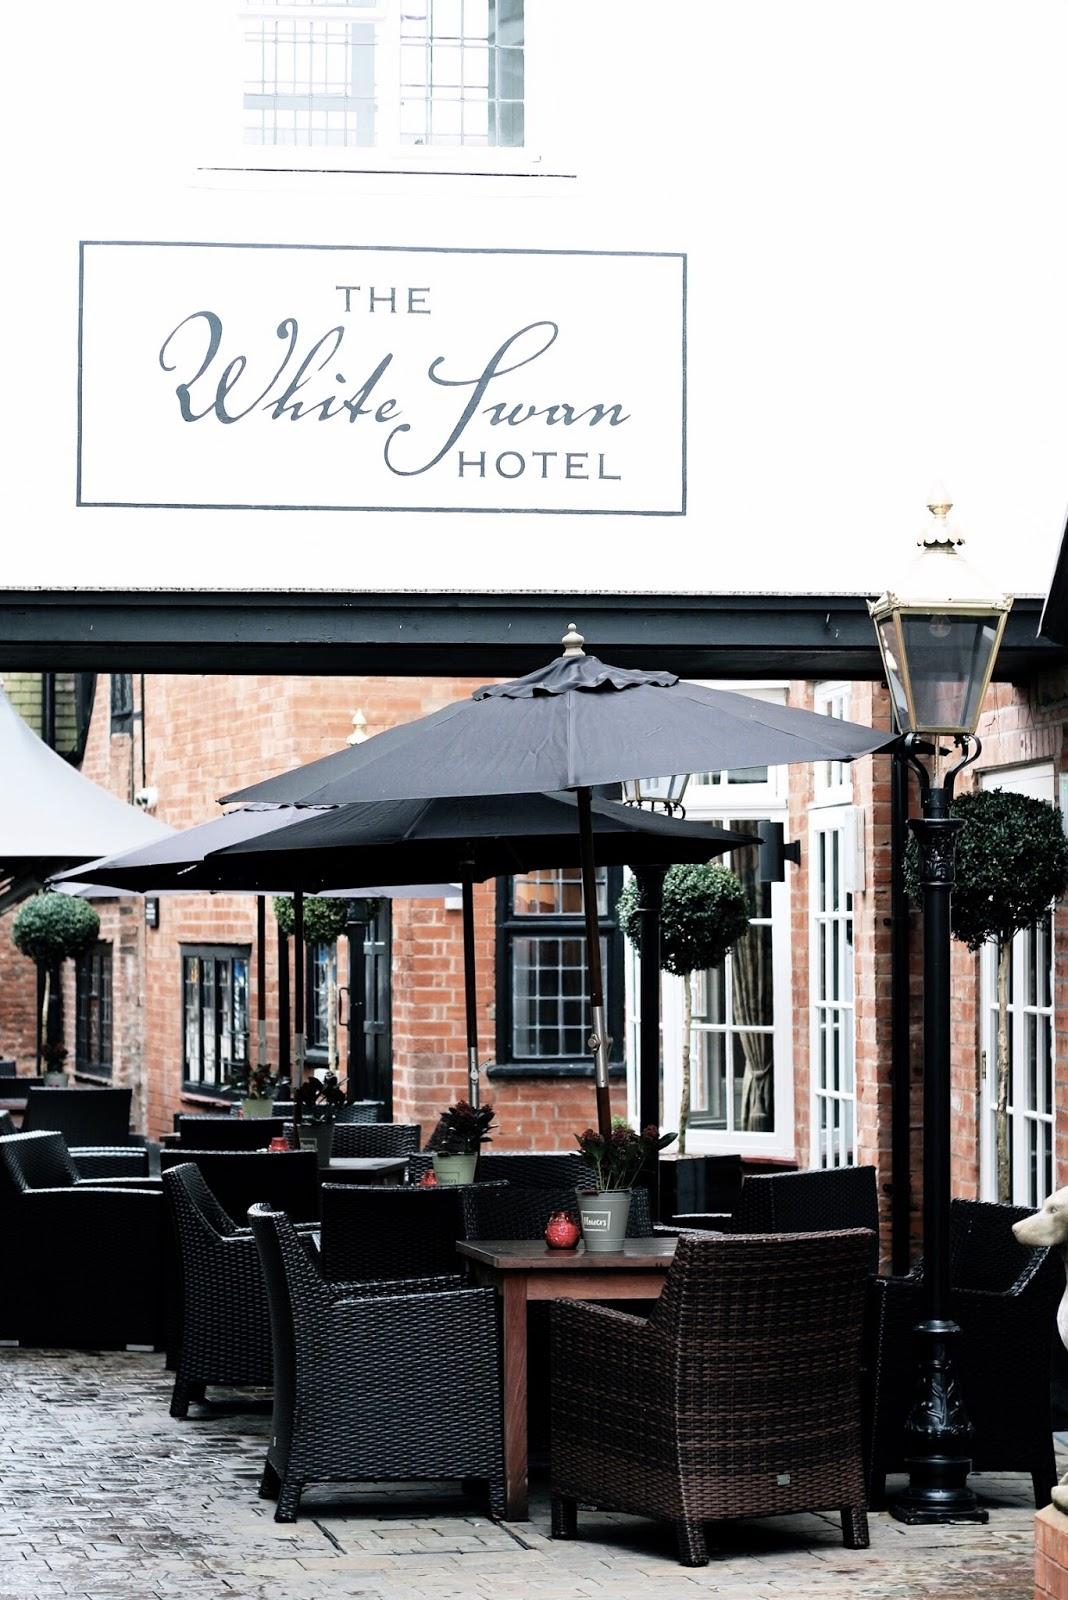 Stratford-upon-Avon The White Swan Hotel